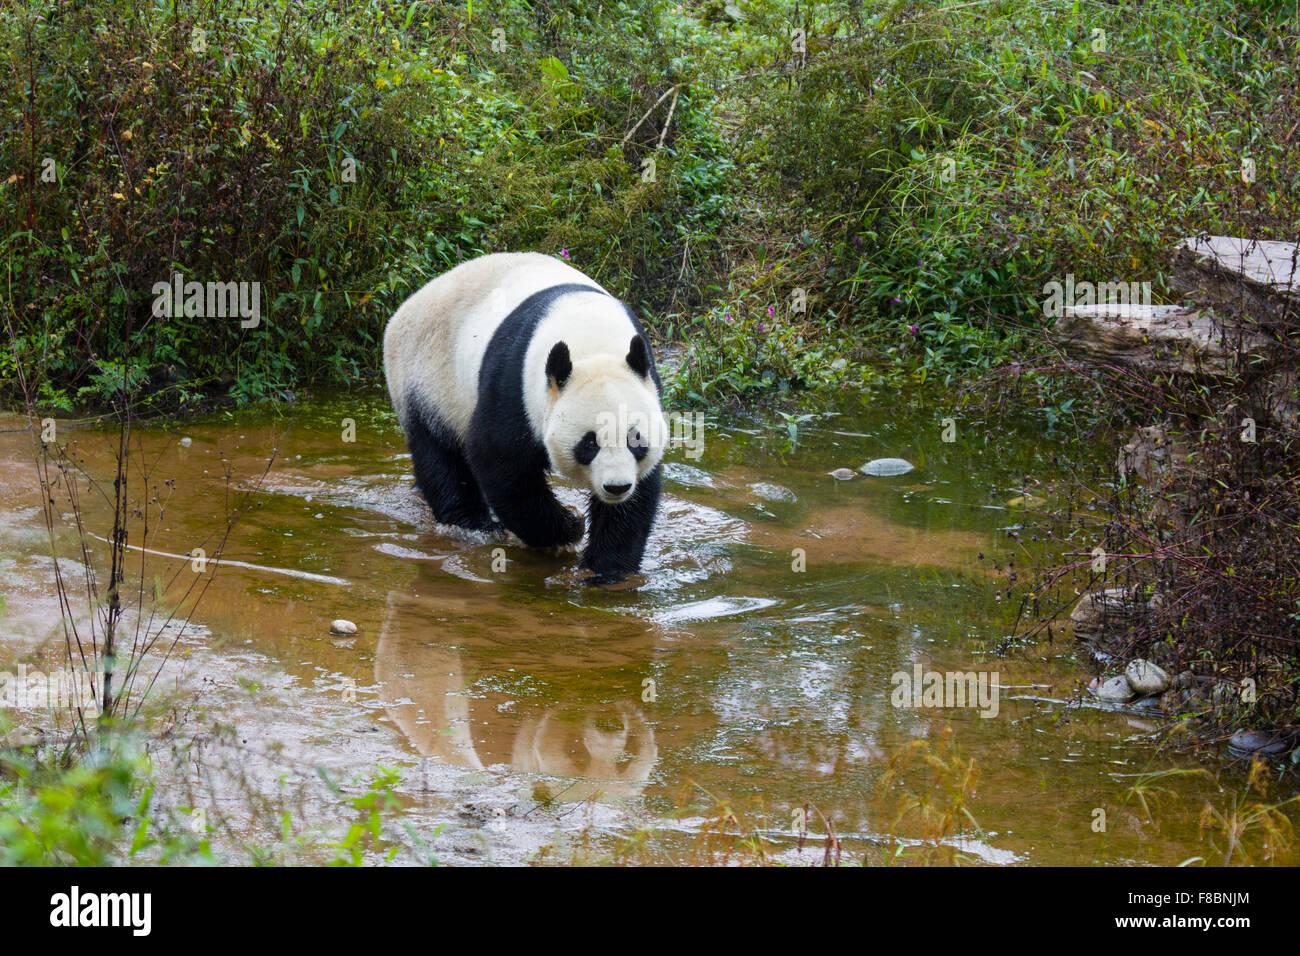 Panda Ailuropoda melanoleuca Bifengia Panda Base Sichuan Province China MA003064 - Stock Image